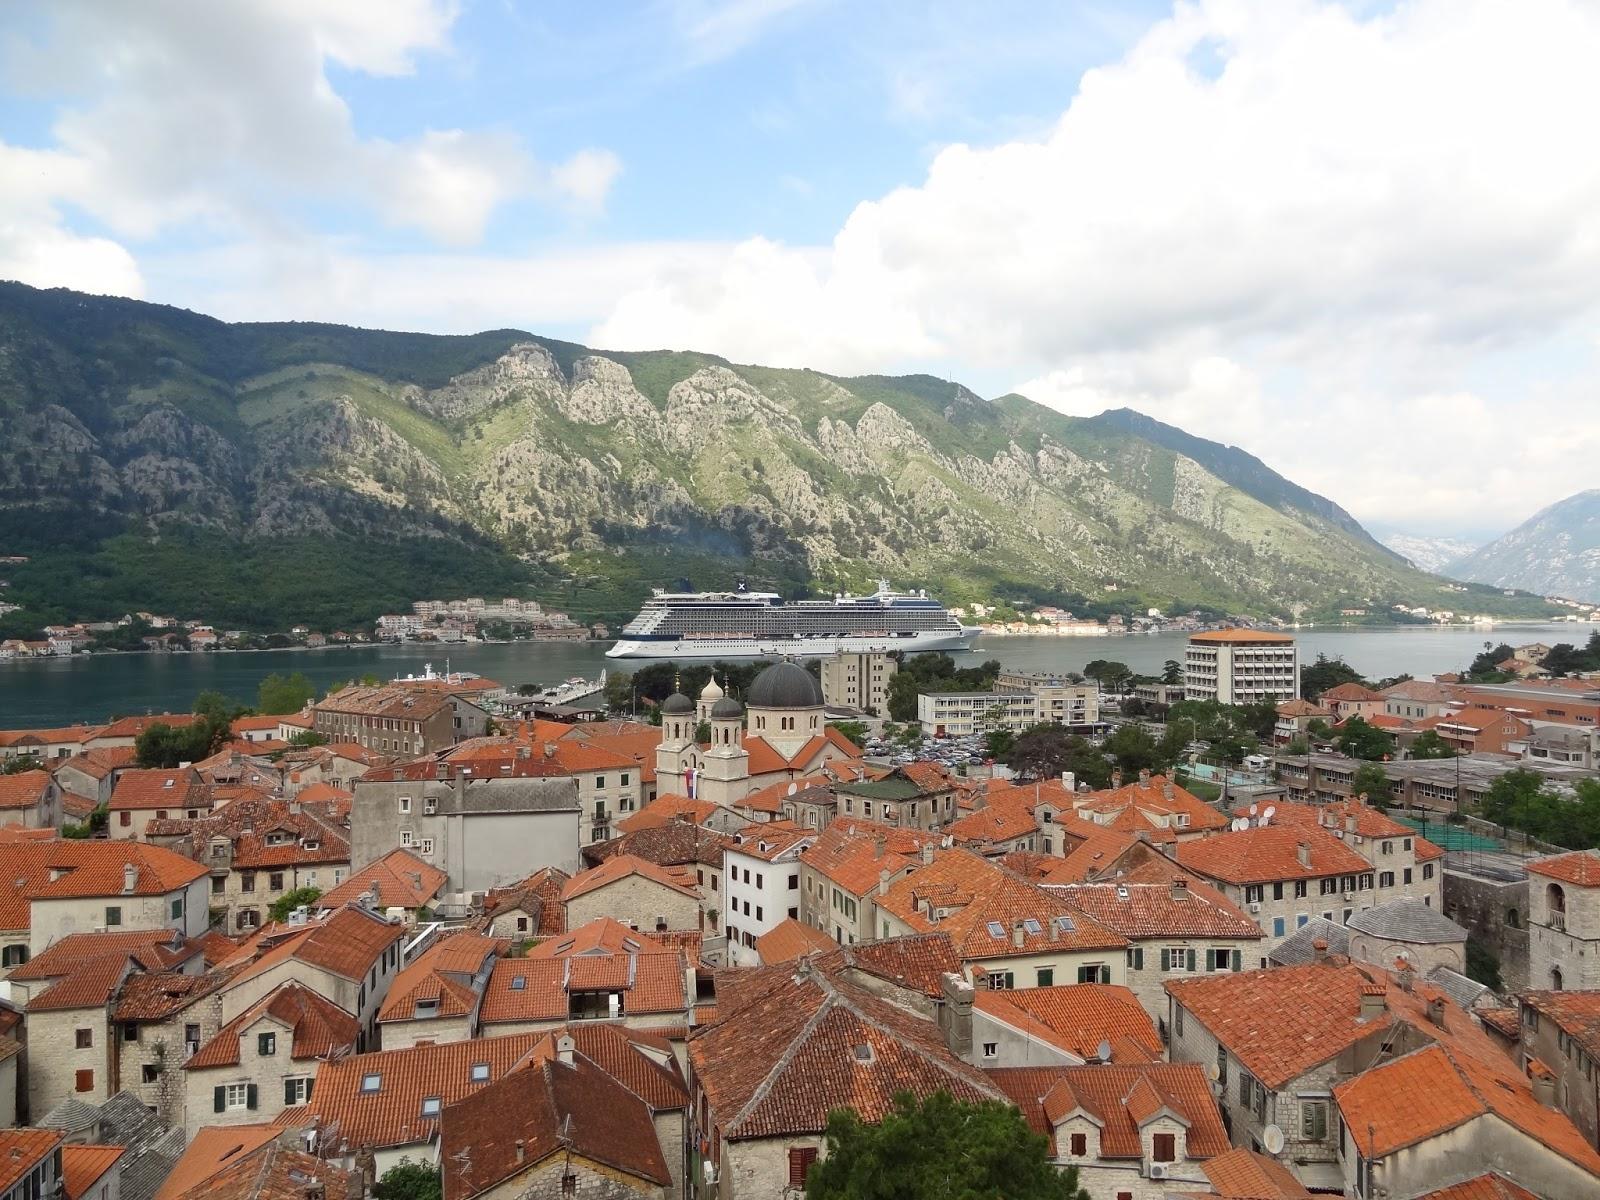 29/2012, Tuesday, Kotor, Montenegro